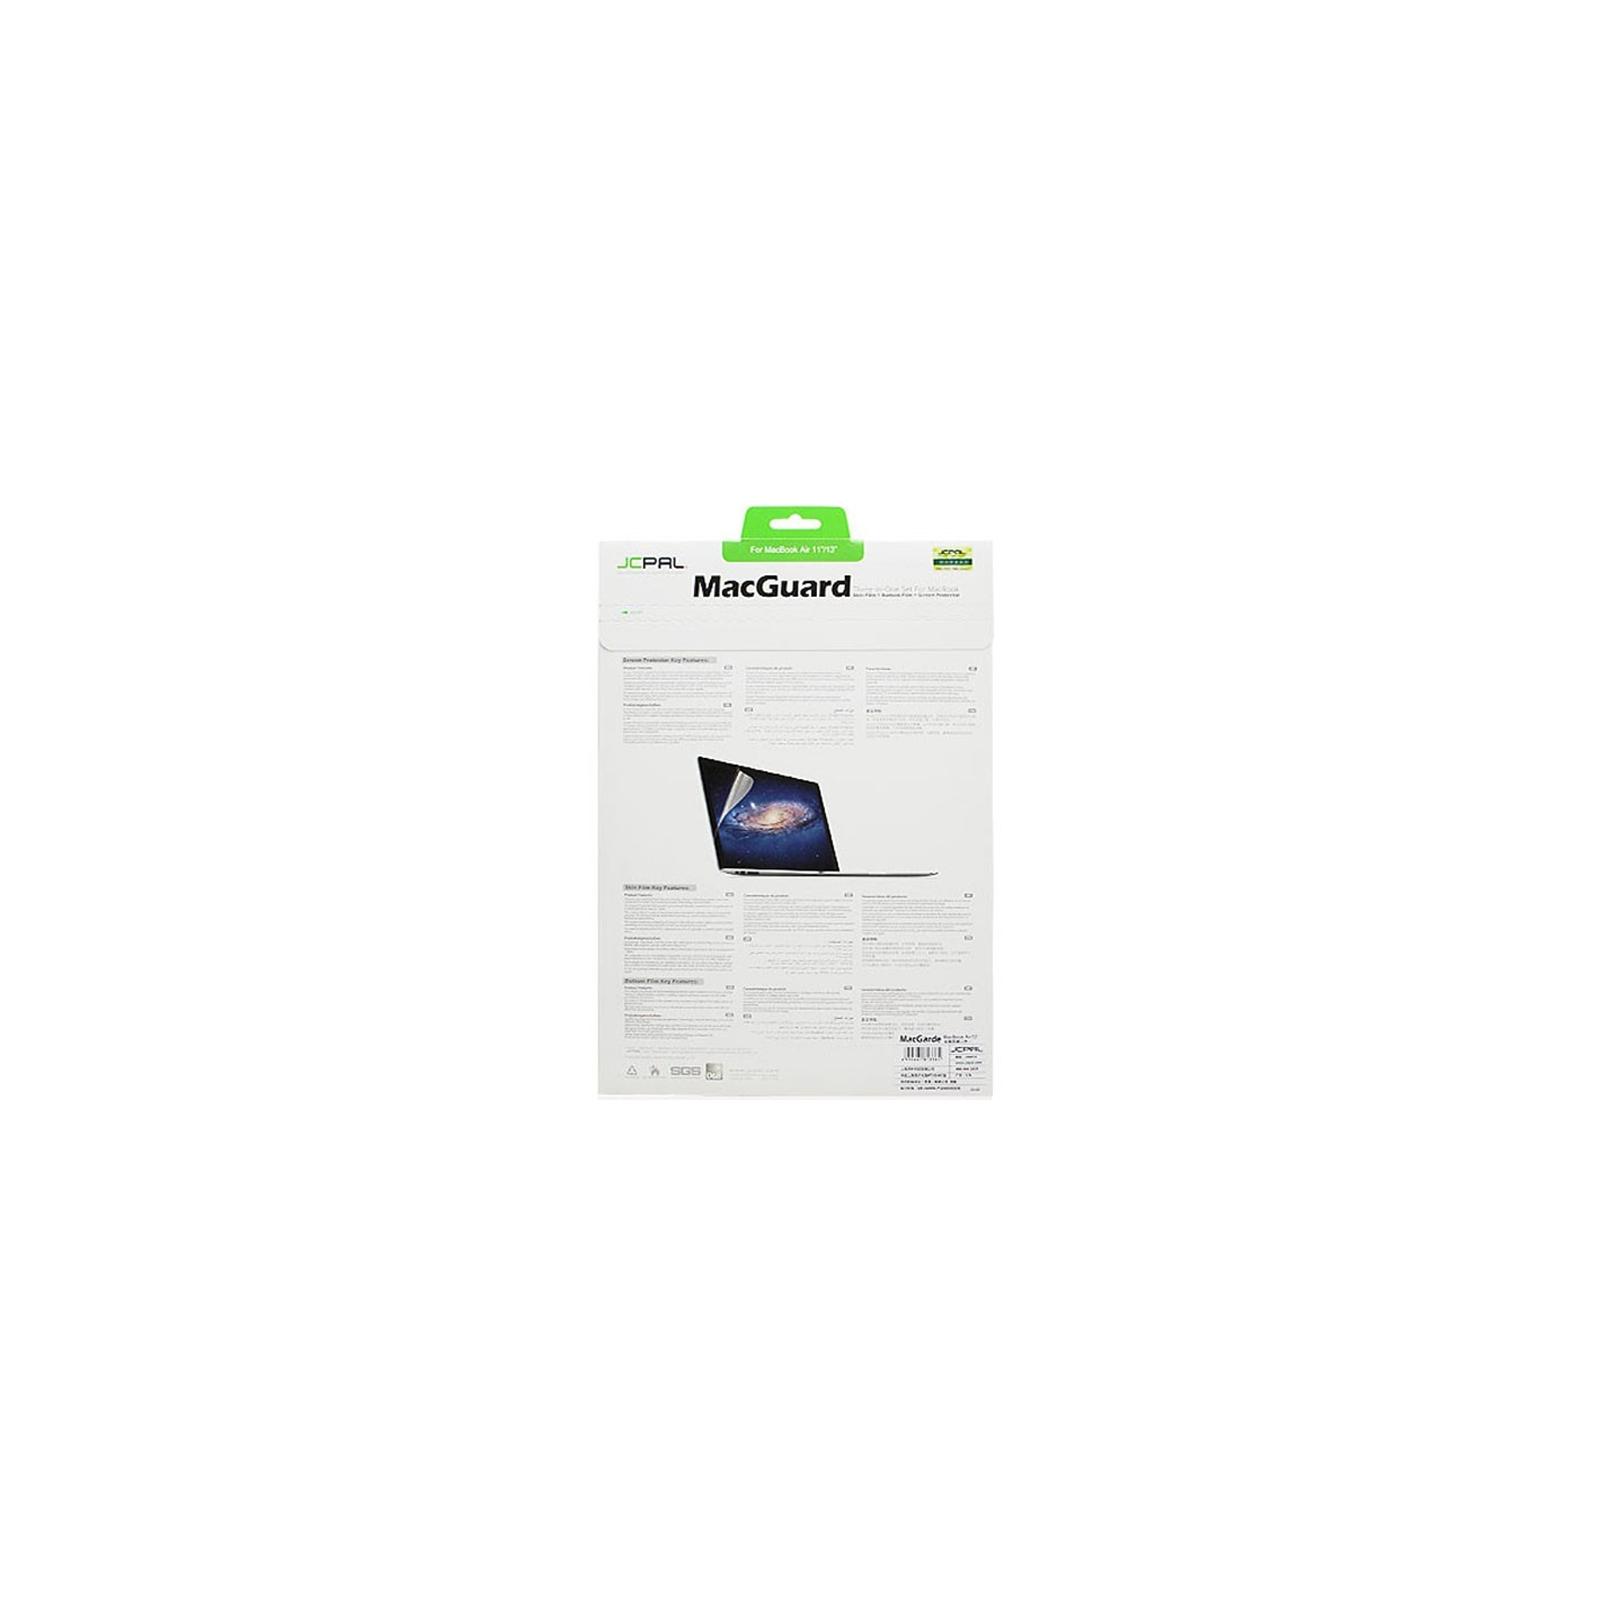 Пленка защитная JCPAL 3 in 1 set для MacBook Pro 15 (JCP2046) изображение 2